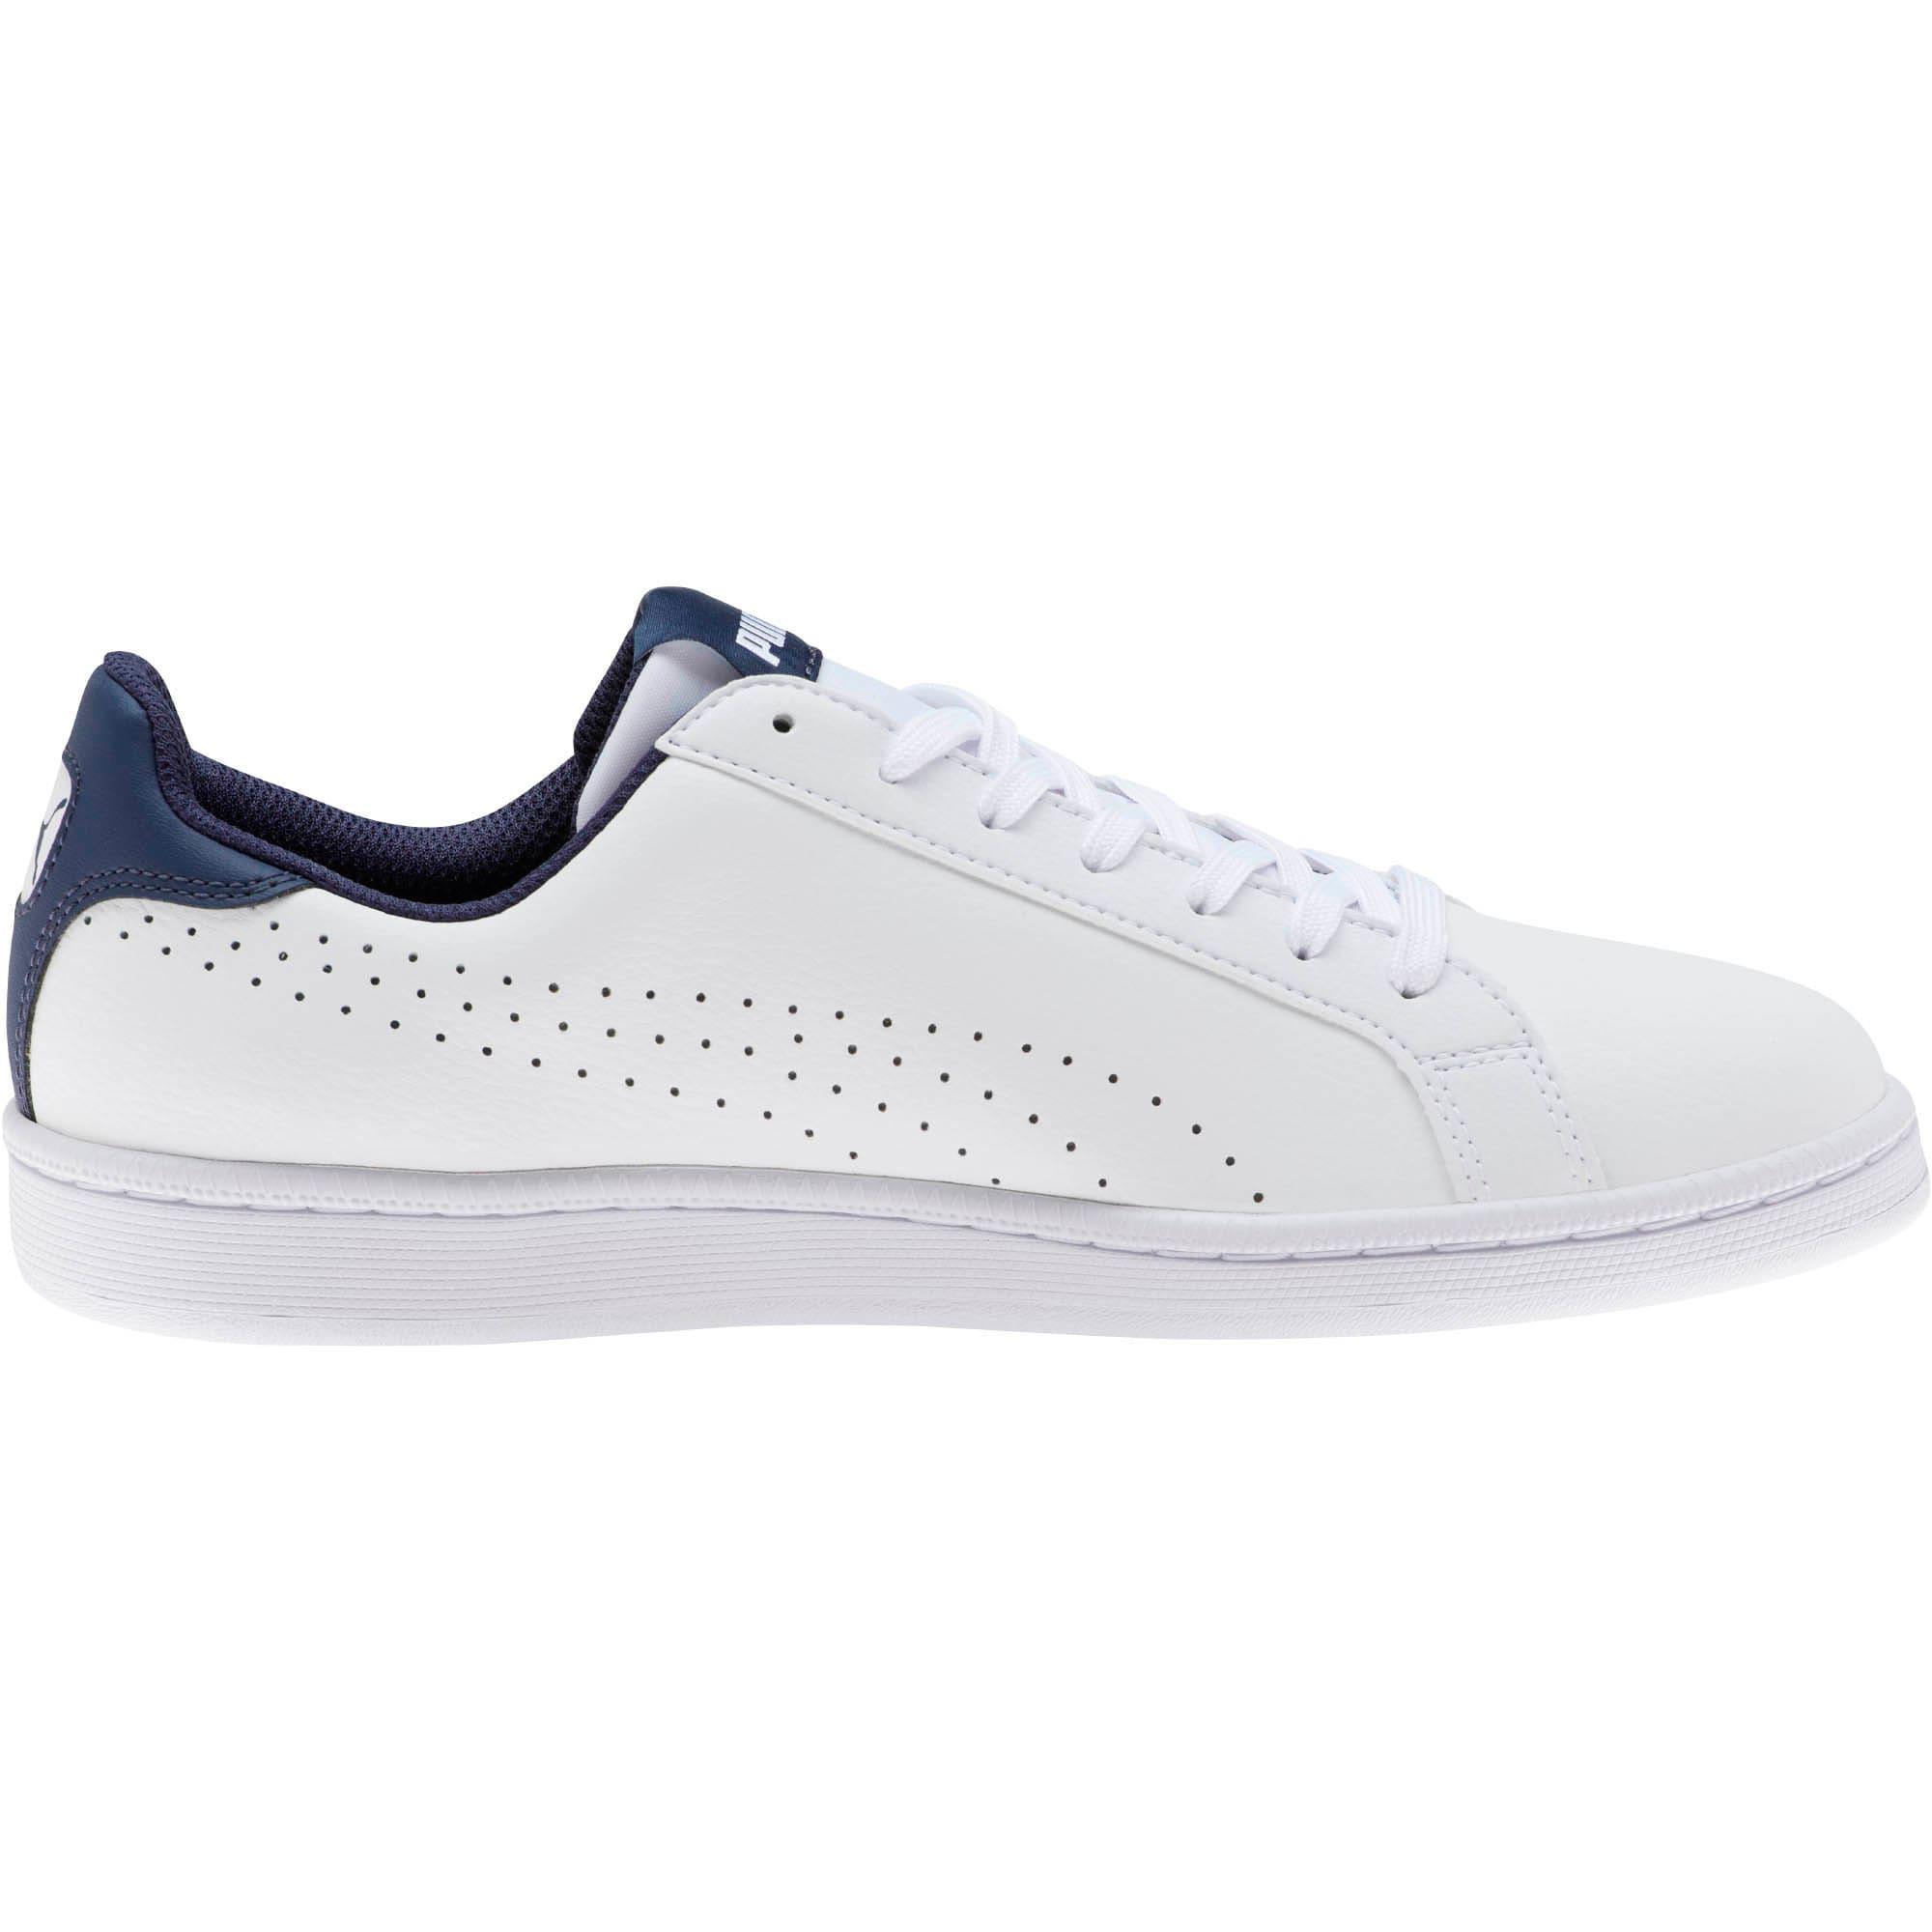 Thumbnail 4 of PUMA Smash Perf Sneakers, Puma White-Peacoat, medium